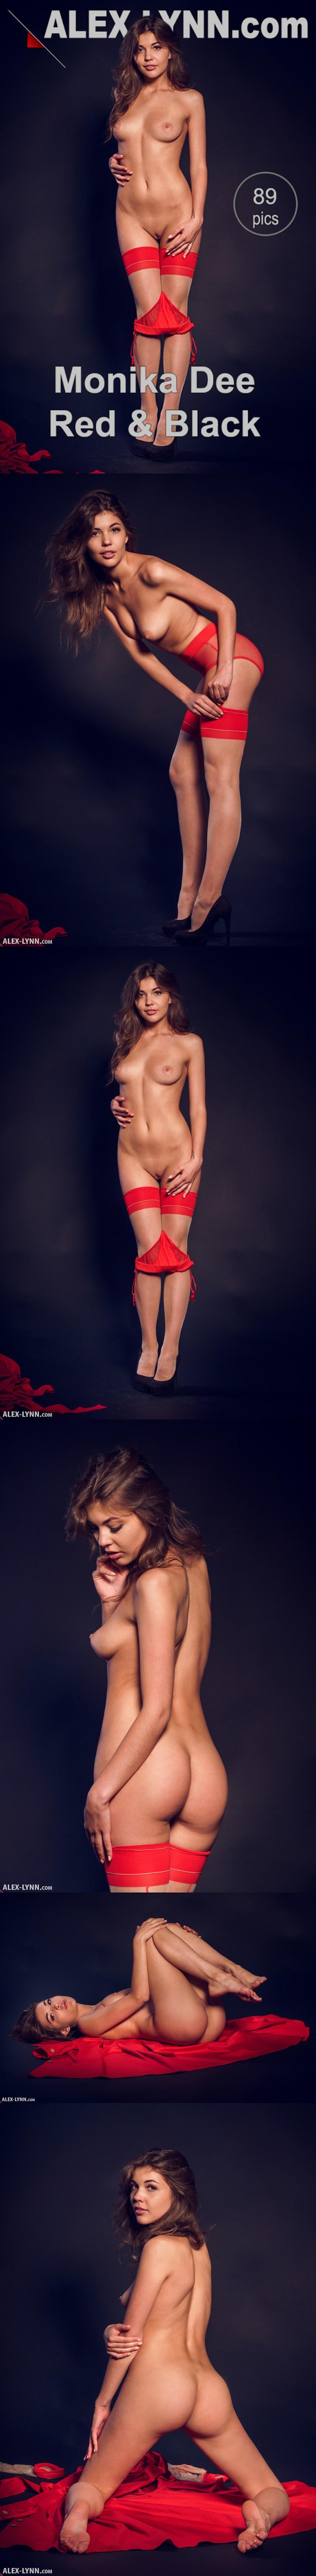 ALn__20180815_Monika_Dee_-_Red__Black.zip-jk- ALn  20180815 Monika Dee - Red  Black